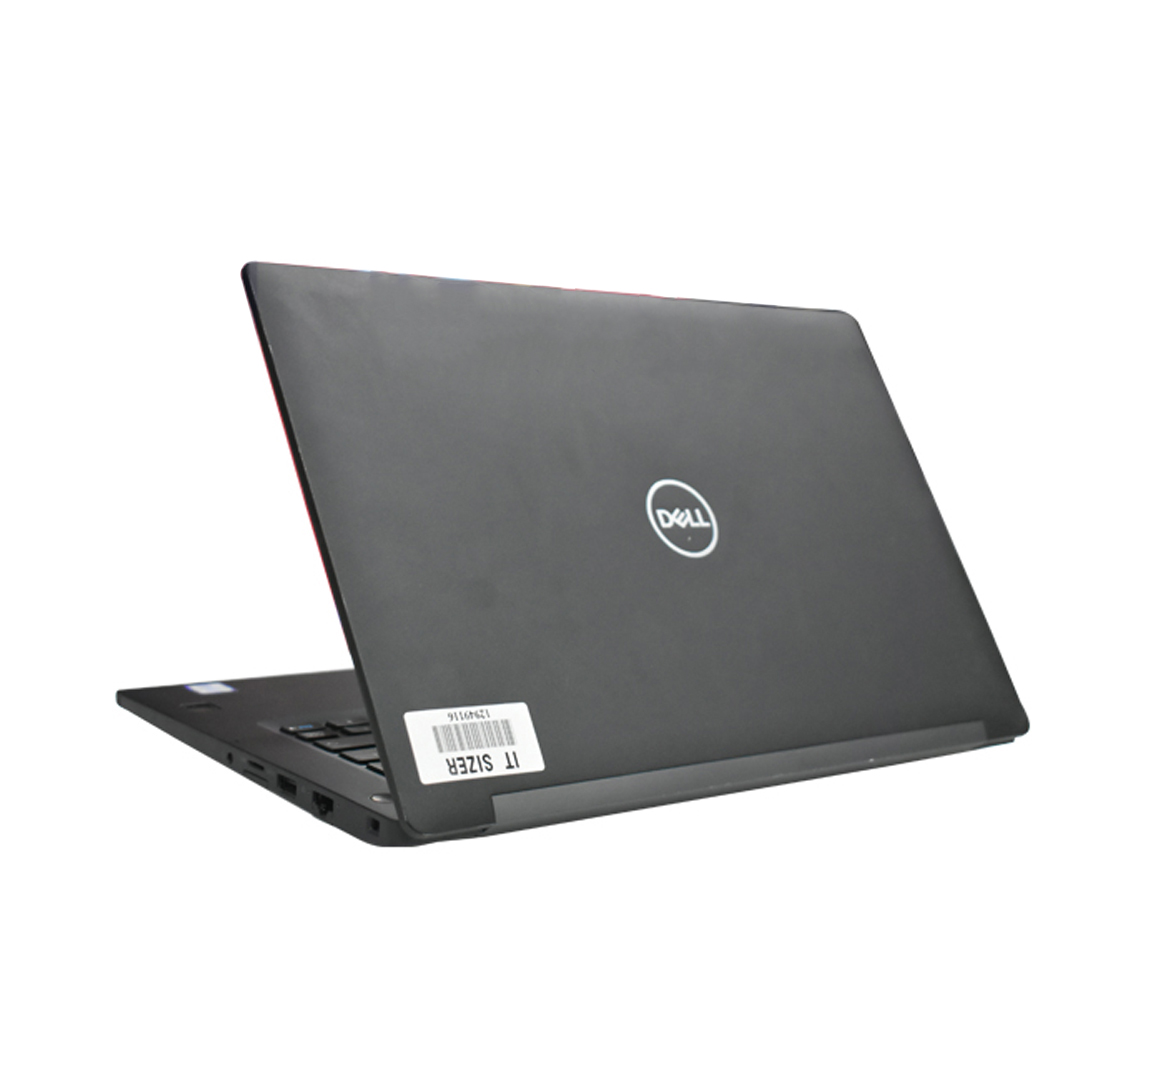 Dell Latitude 7490 Business Laptop, Intel Core i5-7300U CPU, 8GB DDR4 SODIMM RAM, 256GB SSD M2, 14 inch Display, Windows 10 Pro (Refurbished)